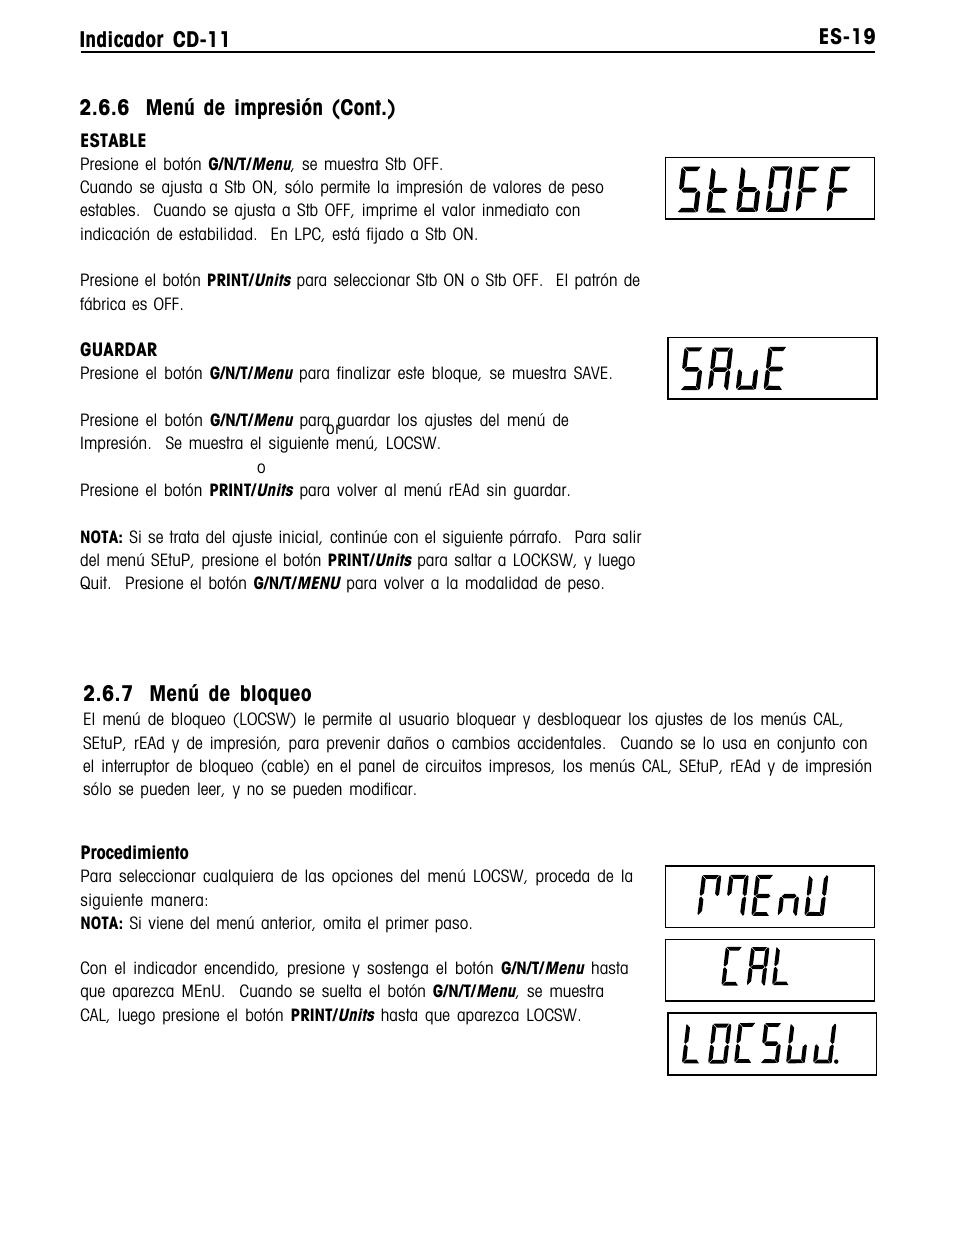 ohaus cd 11 indicator manual multi user manual page 63 120 rh manualsdir com Setting Exposure in Manual Mode Manual Mode Cheat Sheet